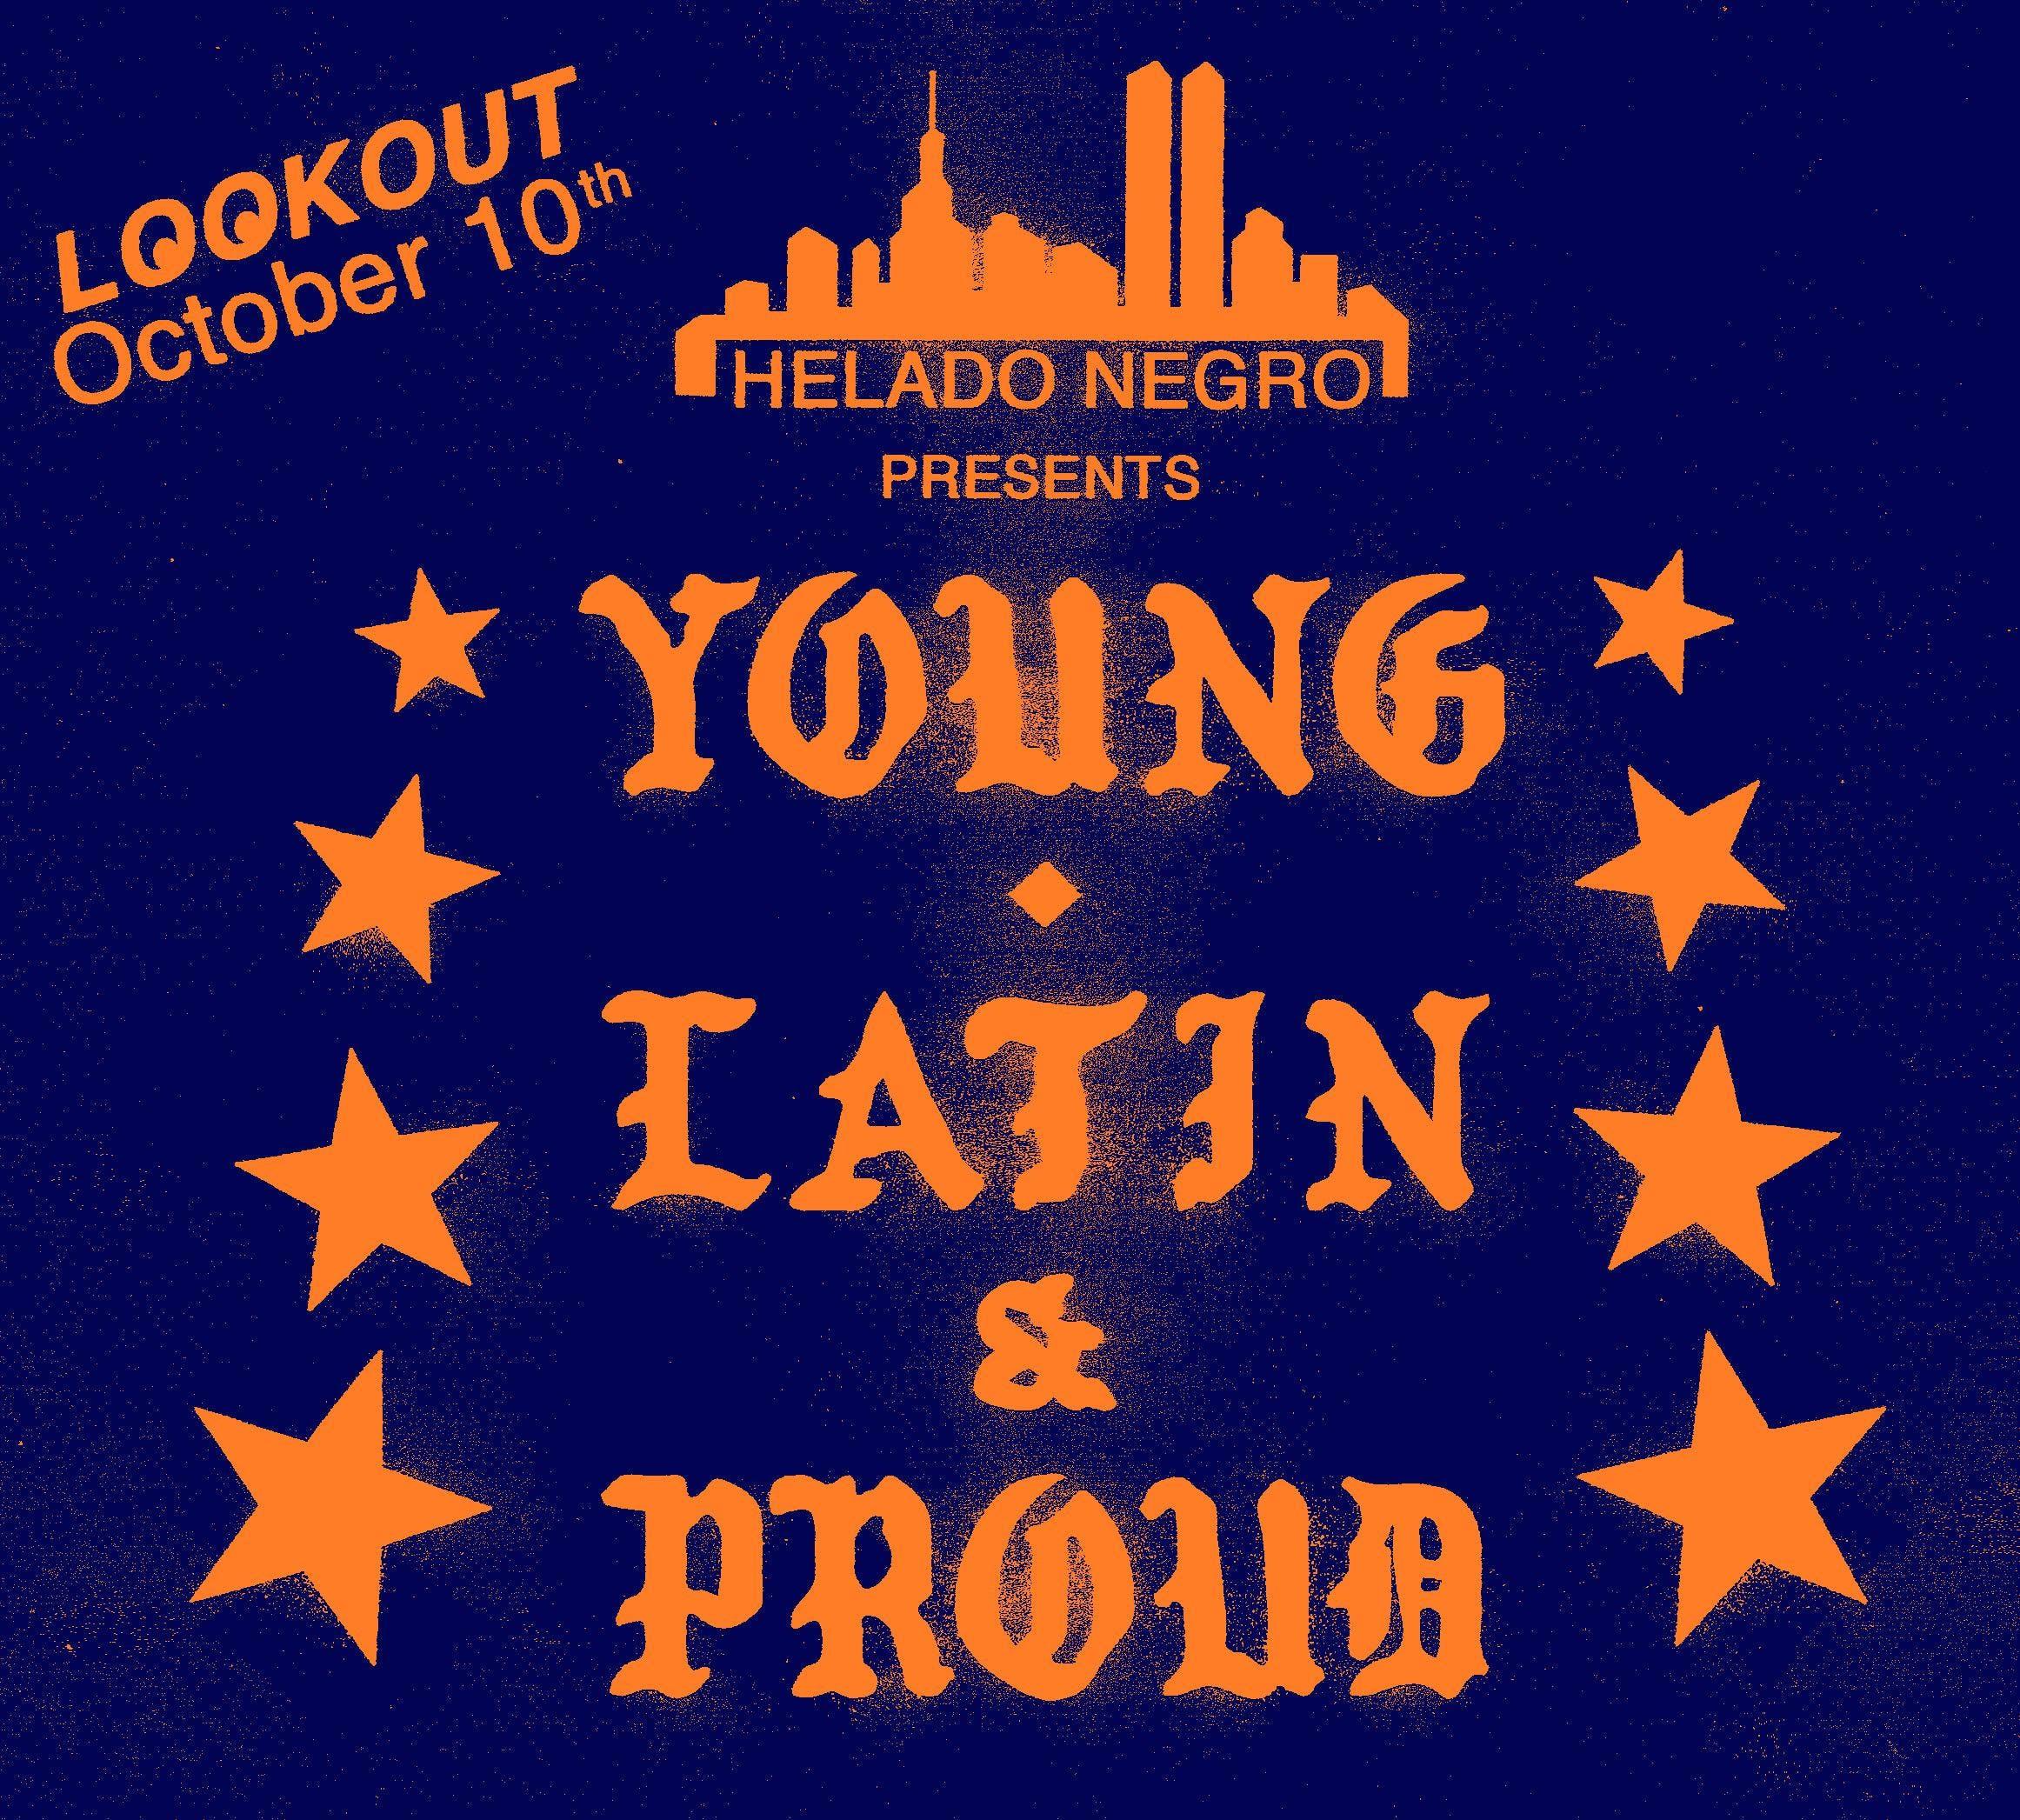 Helado Negro Presents: Young Latin & Proud w/ La Orquesta Triunfadora, Xenia Rubinos, Combo Chimbita, Helado Negro, Papi Juice, RIOBAMBA, Bembona